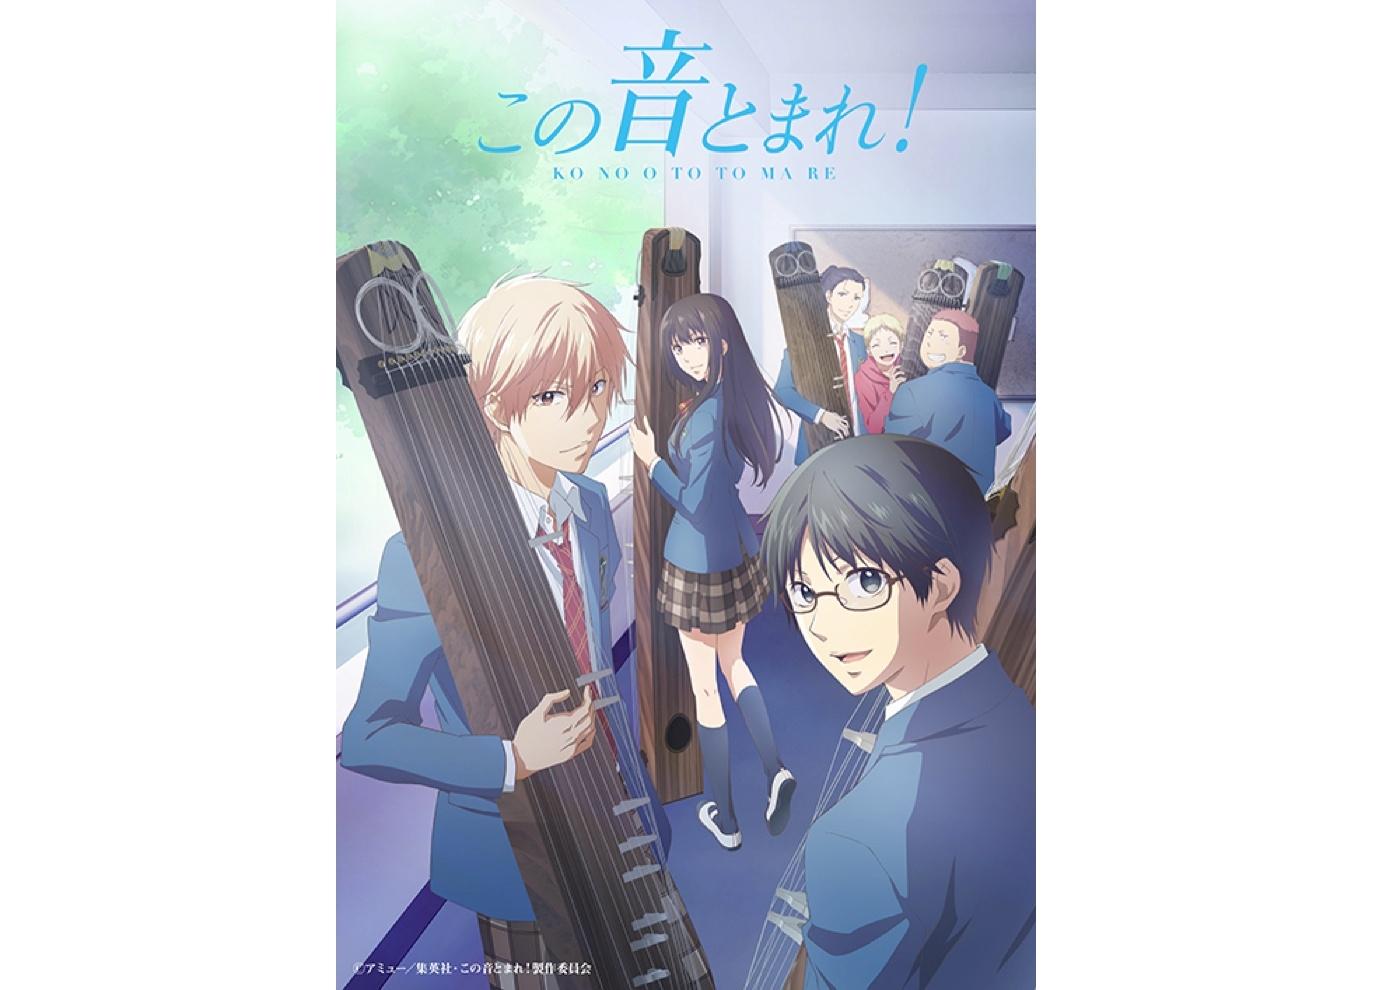 TVアニメ『この音とまれ!』追加キャストに東山奈央が決定